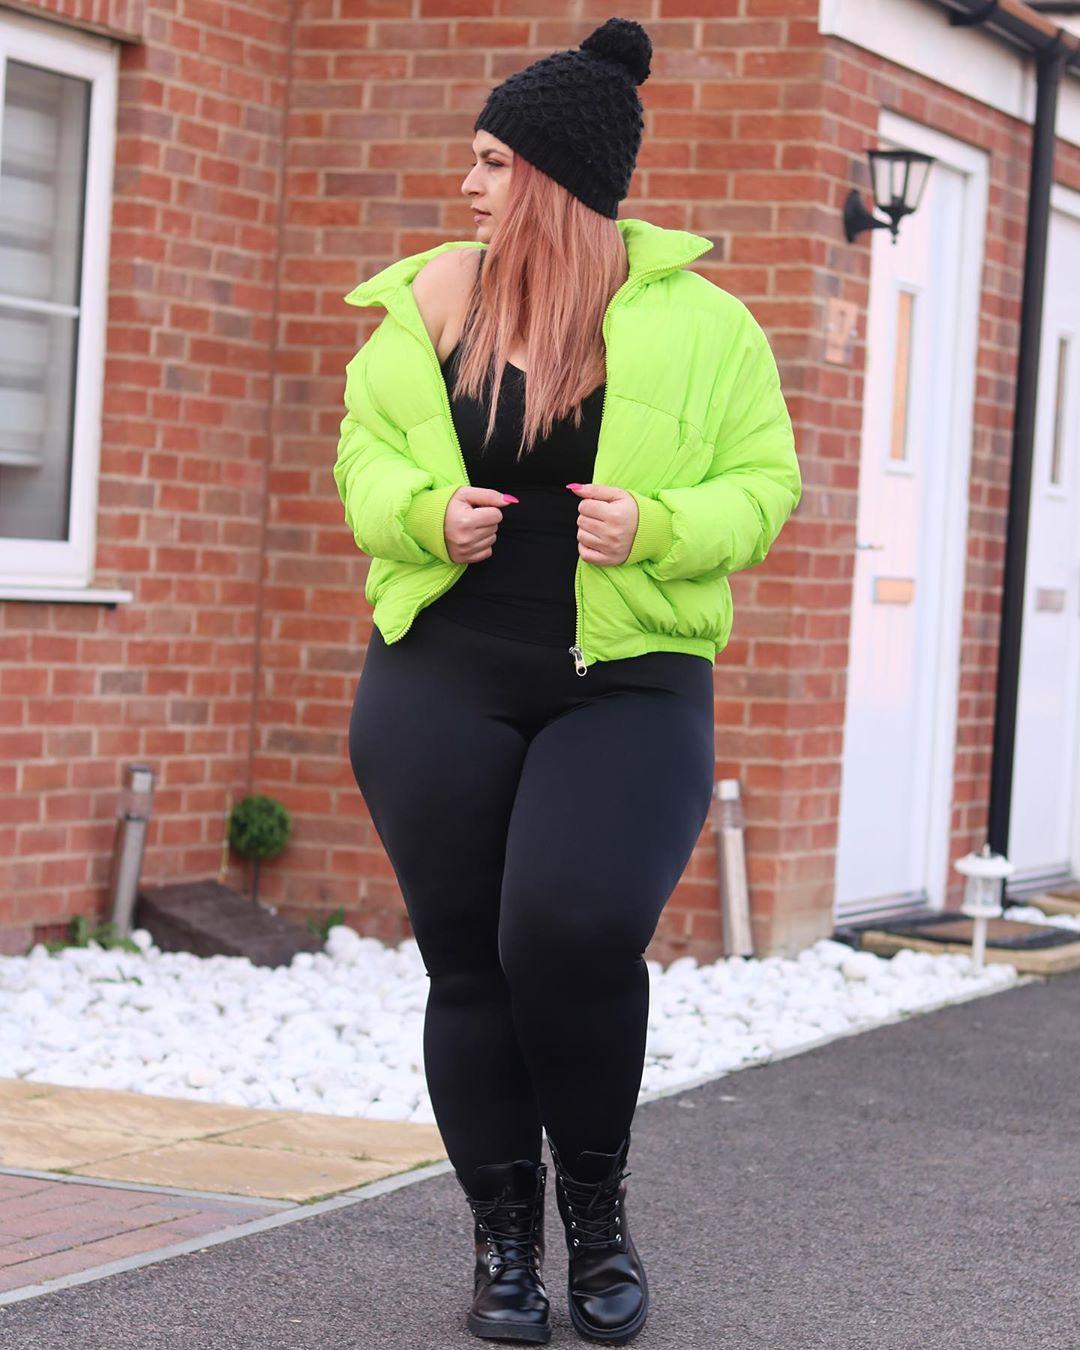 Yellow and green sportswear, leggings, beanie